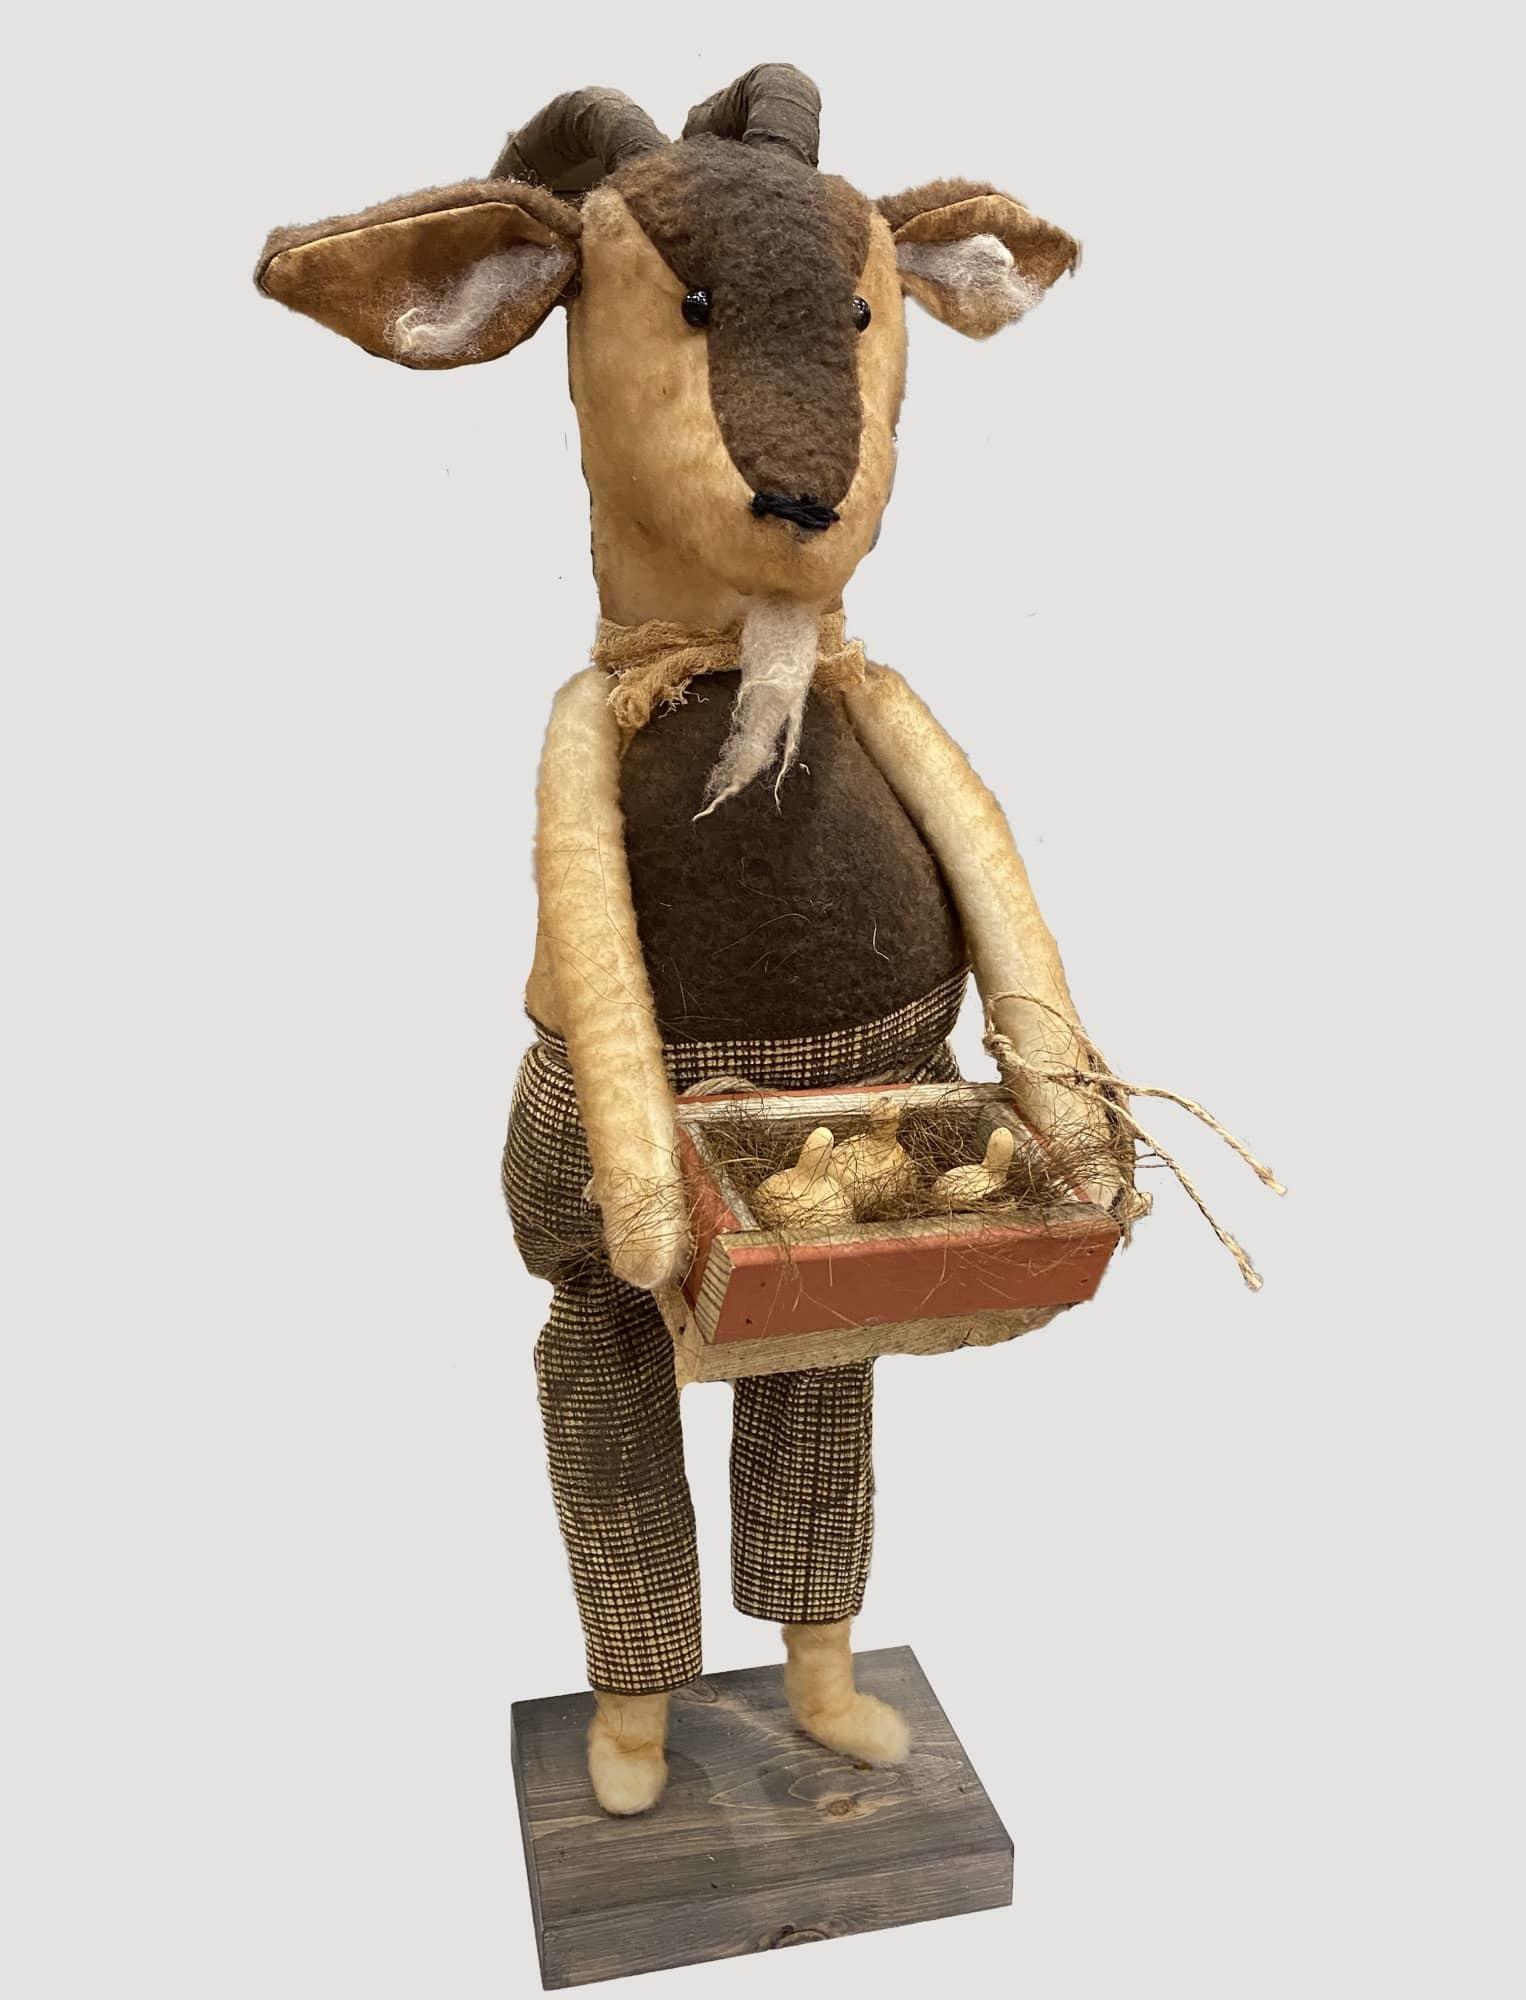 Nana's Farmhouse Goat Holding Box Of Gourds